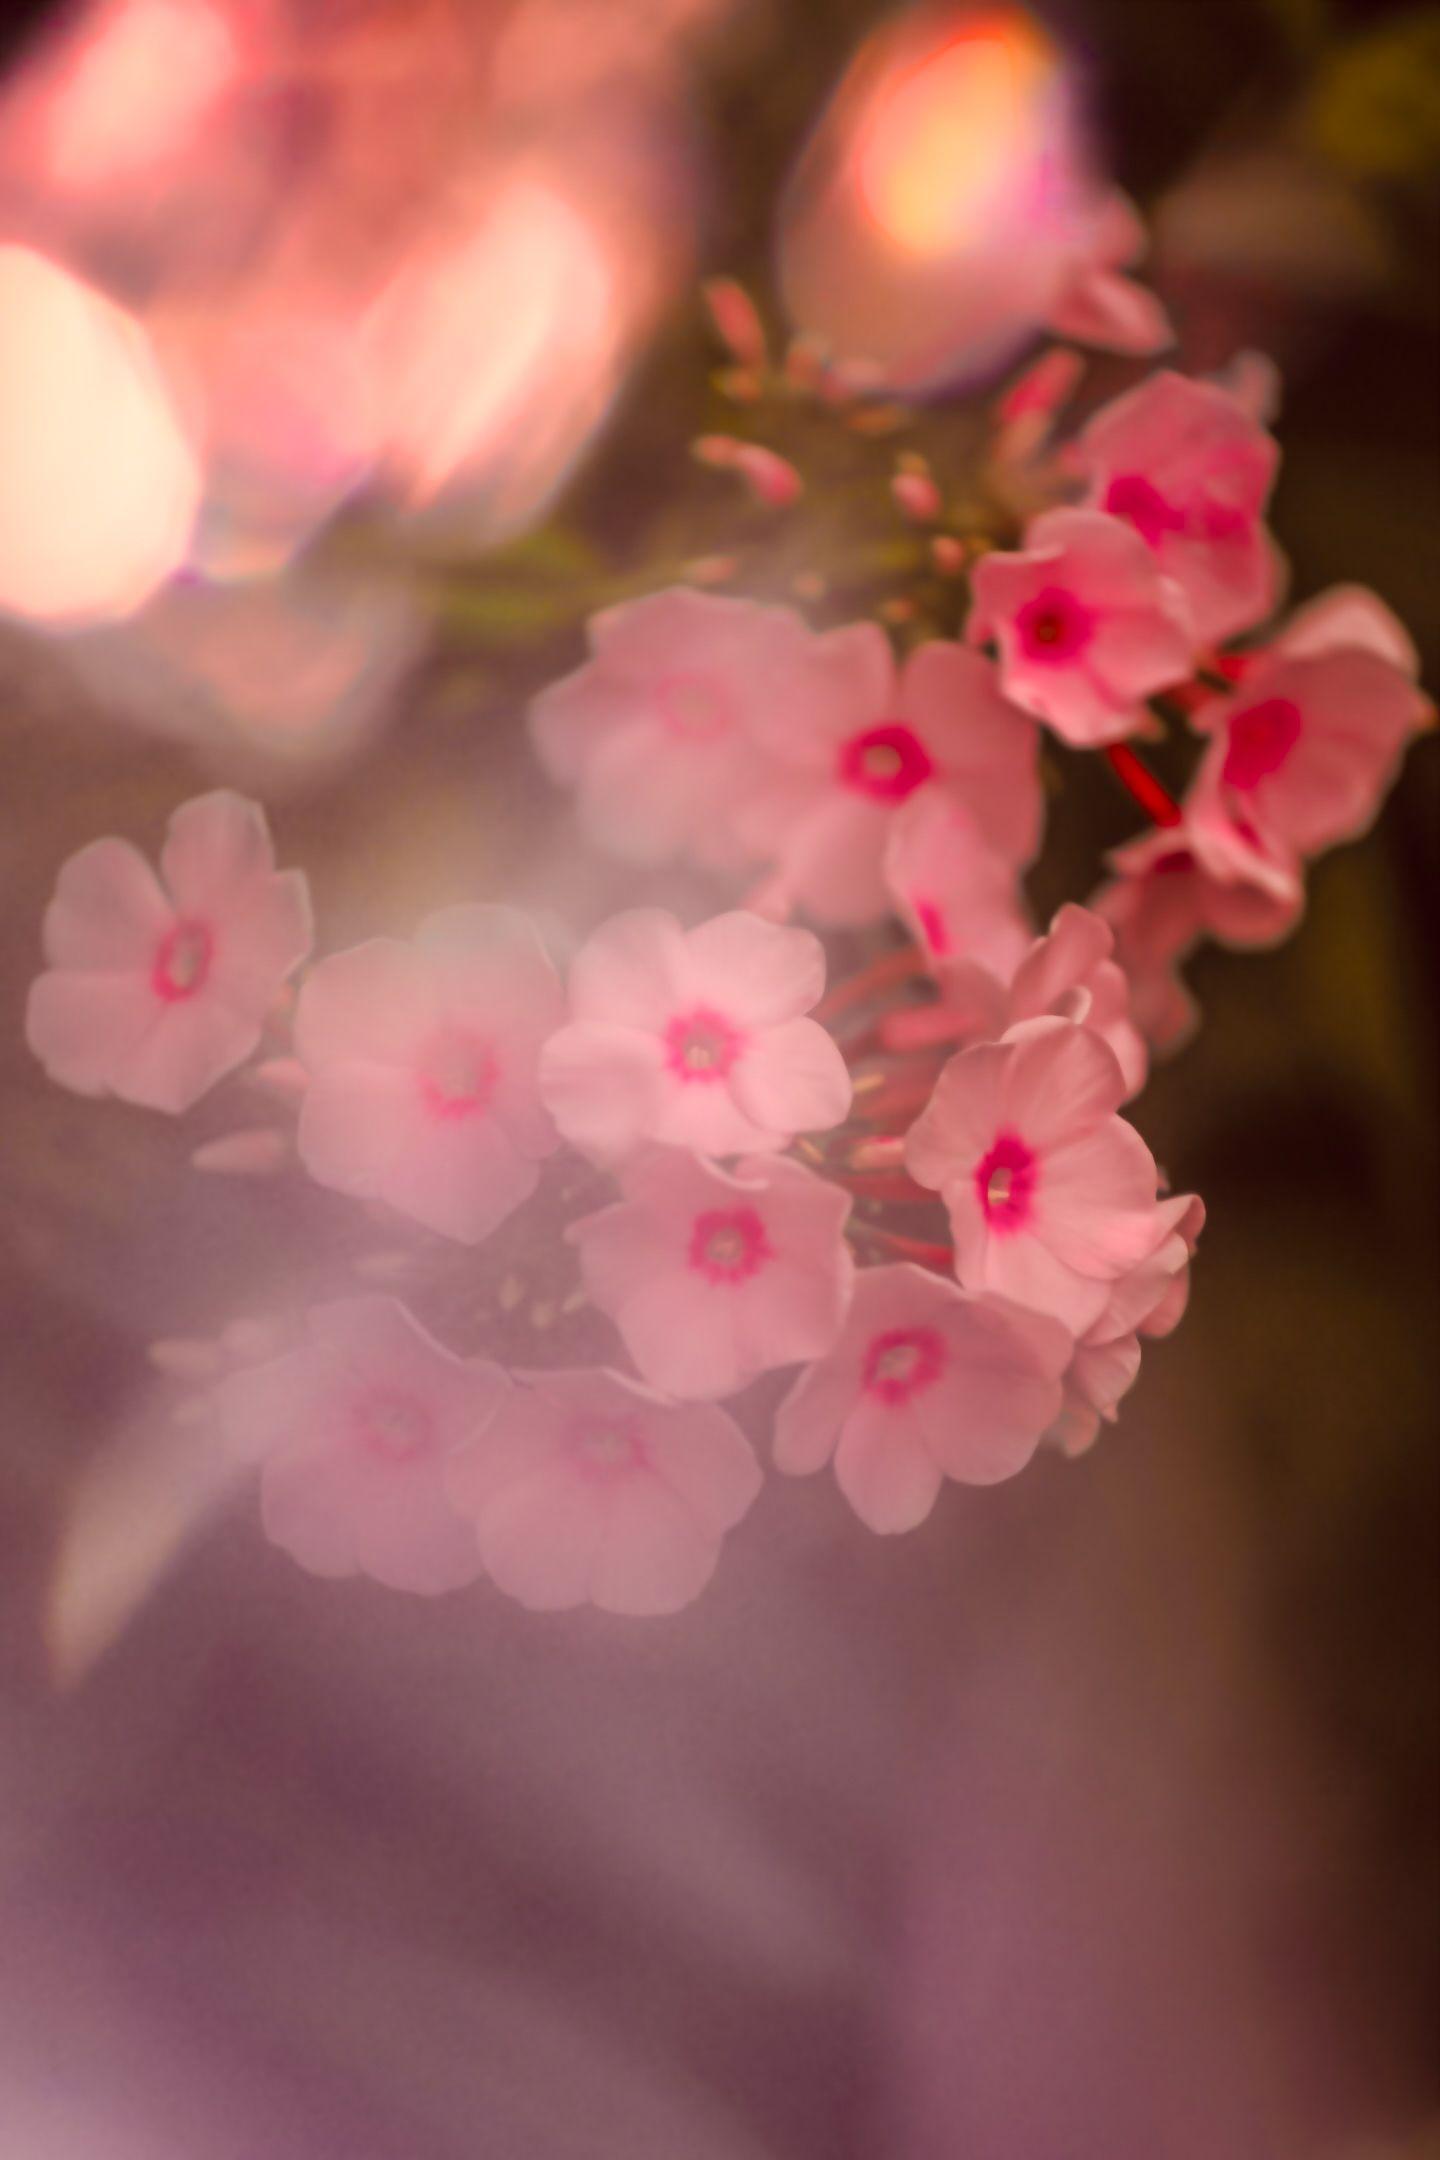 флоксы, цветы, flowers, phloxes, Julia Kaissa